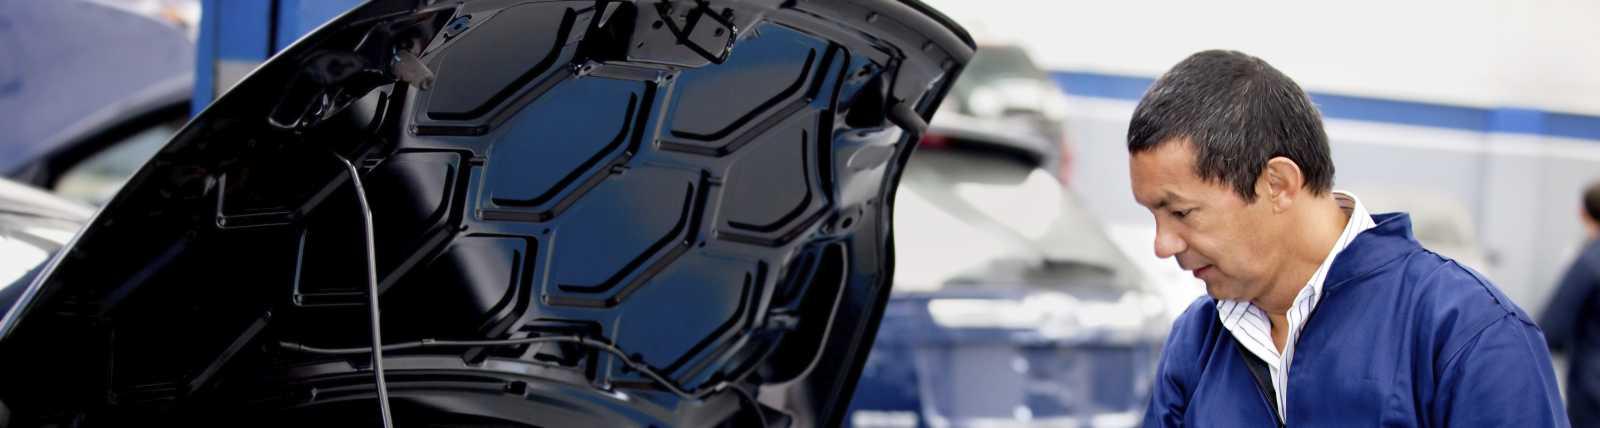 Quality Auto Electric